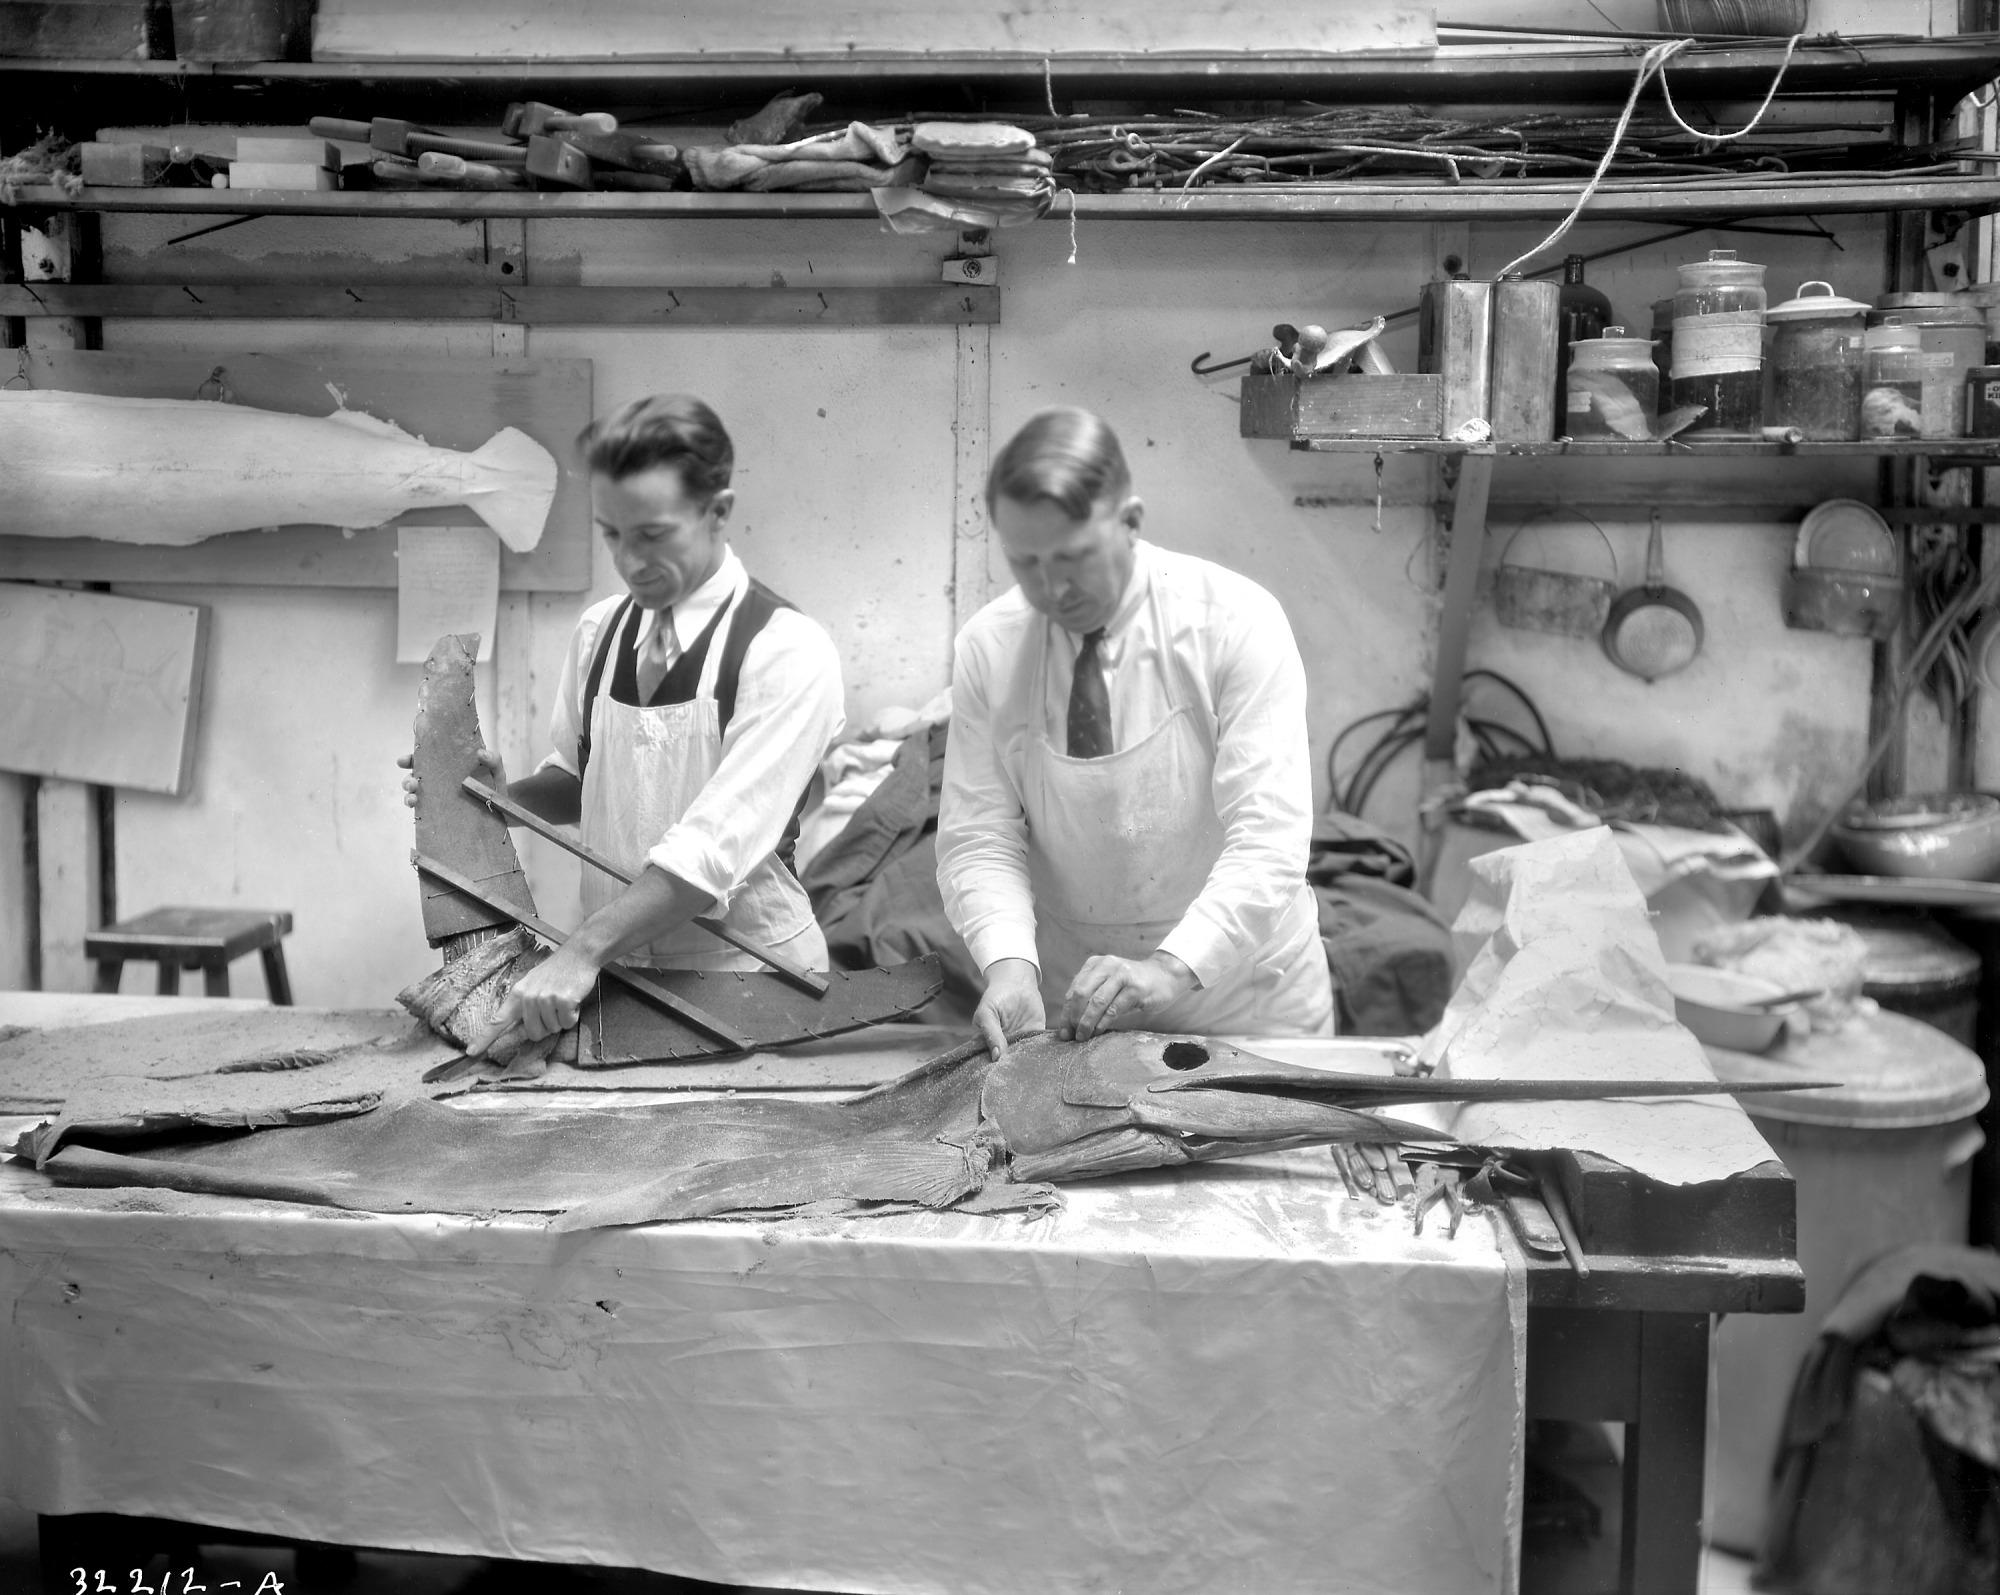 Aschemeier and Perrygo Working on Roosevelt's Sailfish